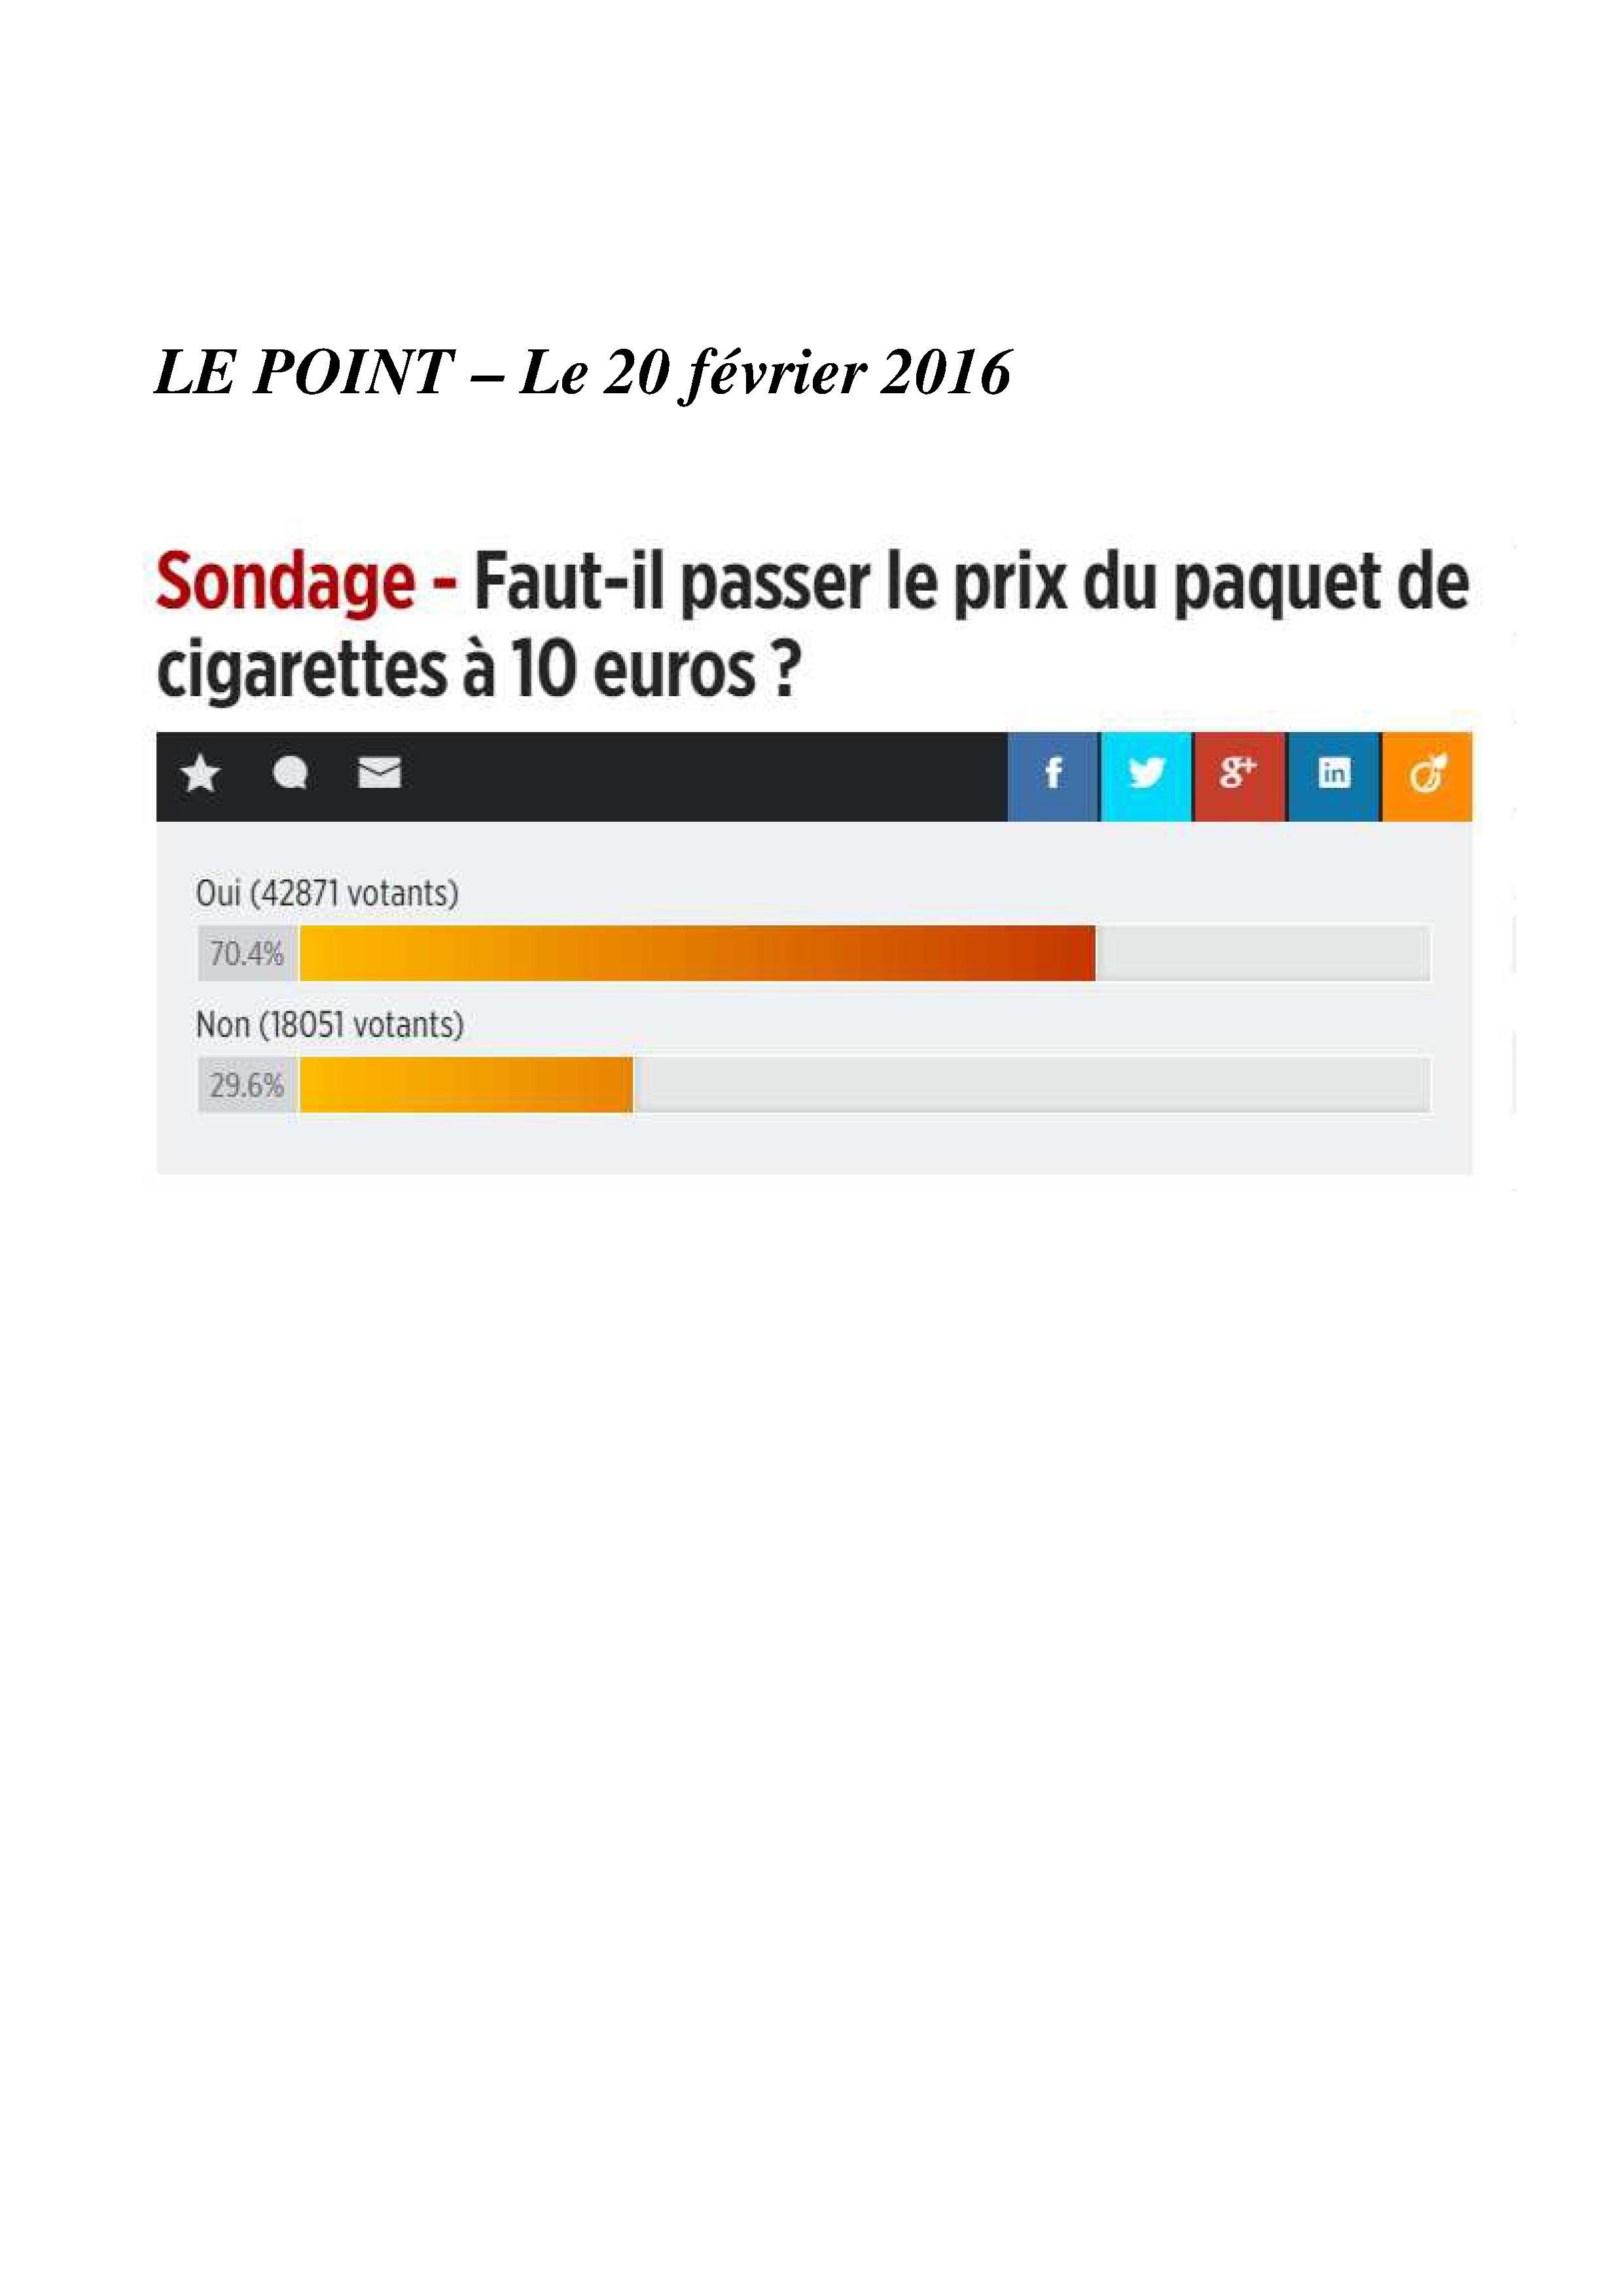 Alliance-DP_journee-mondiale-sans-tabac-avec-annexes-vf-30mai2016_Page_17.jpg